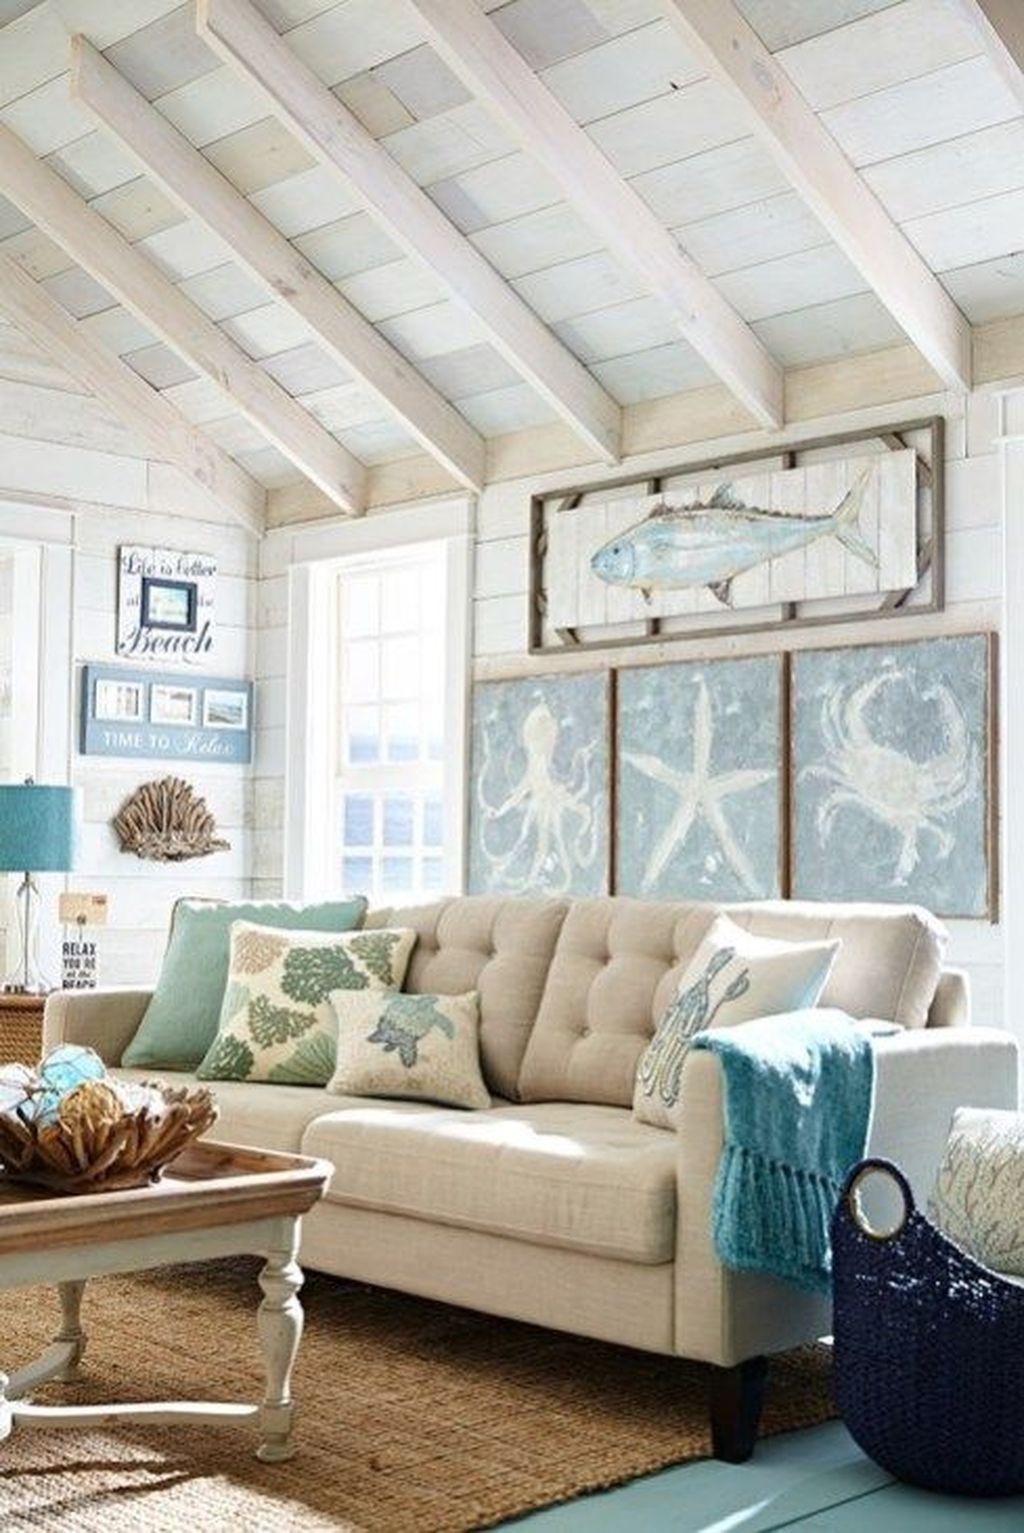 Elegant Coastal Themed Living Room Decorating Ideas25